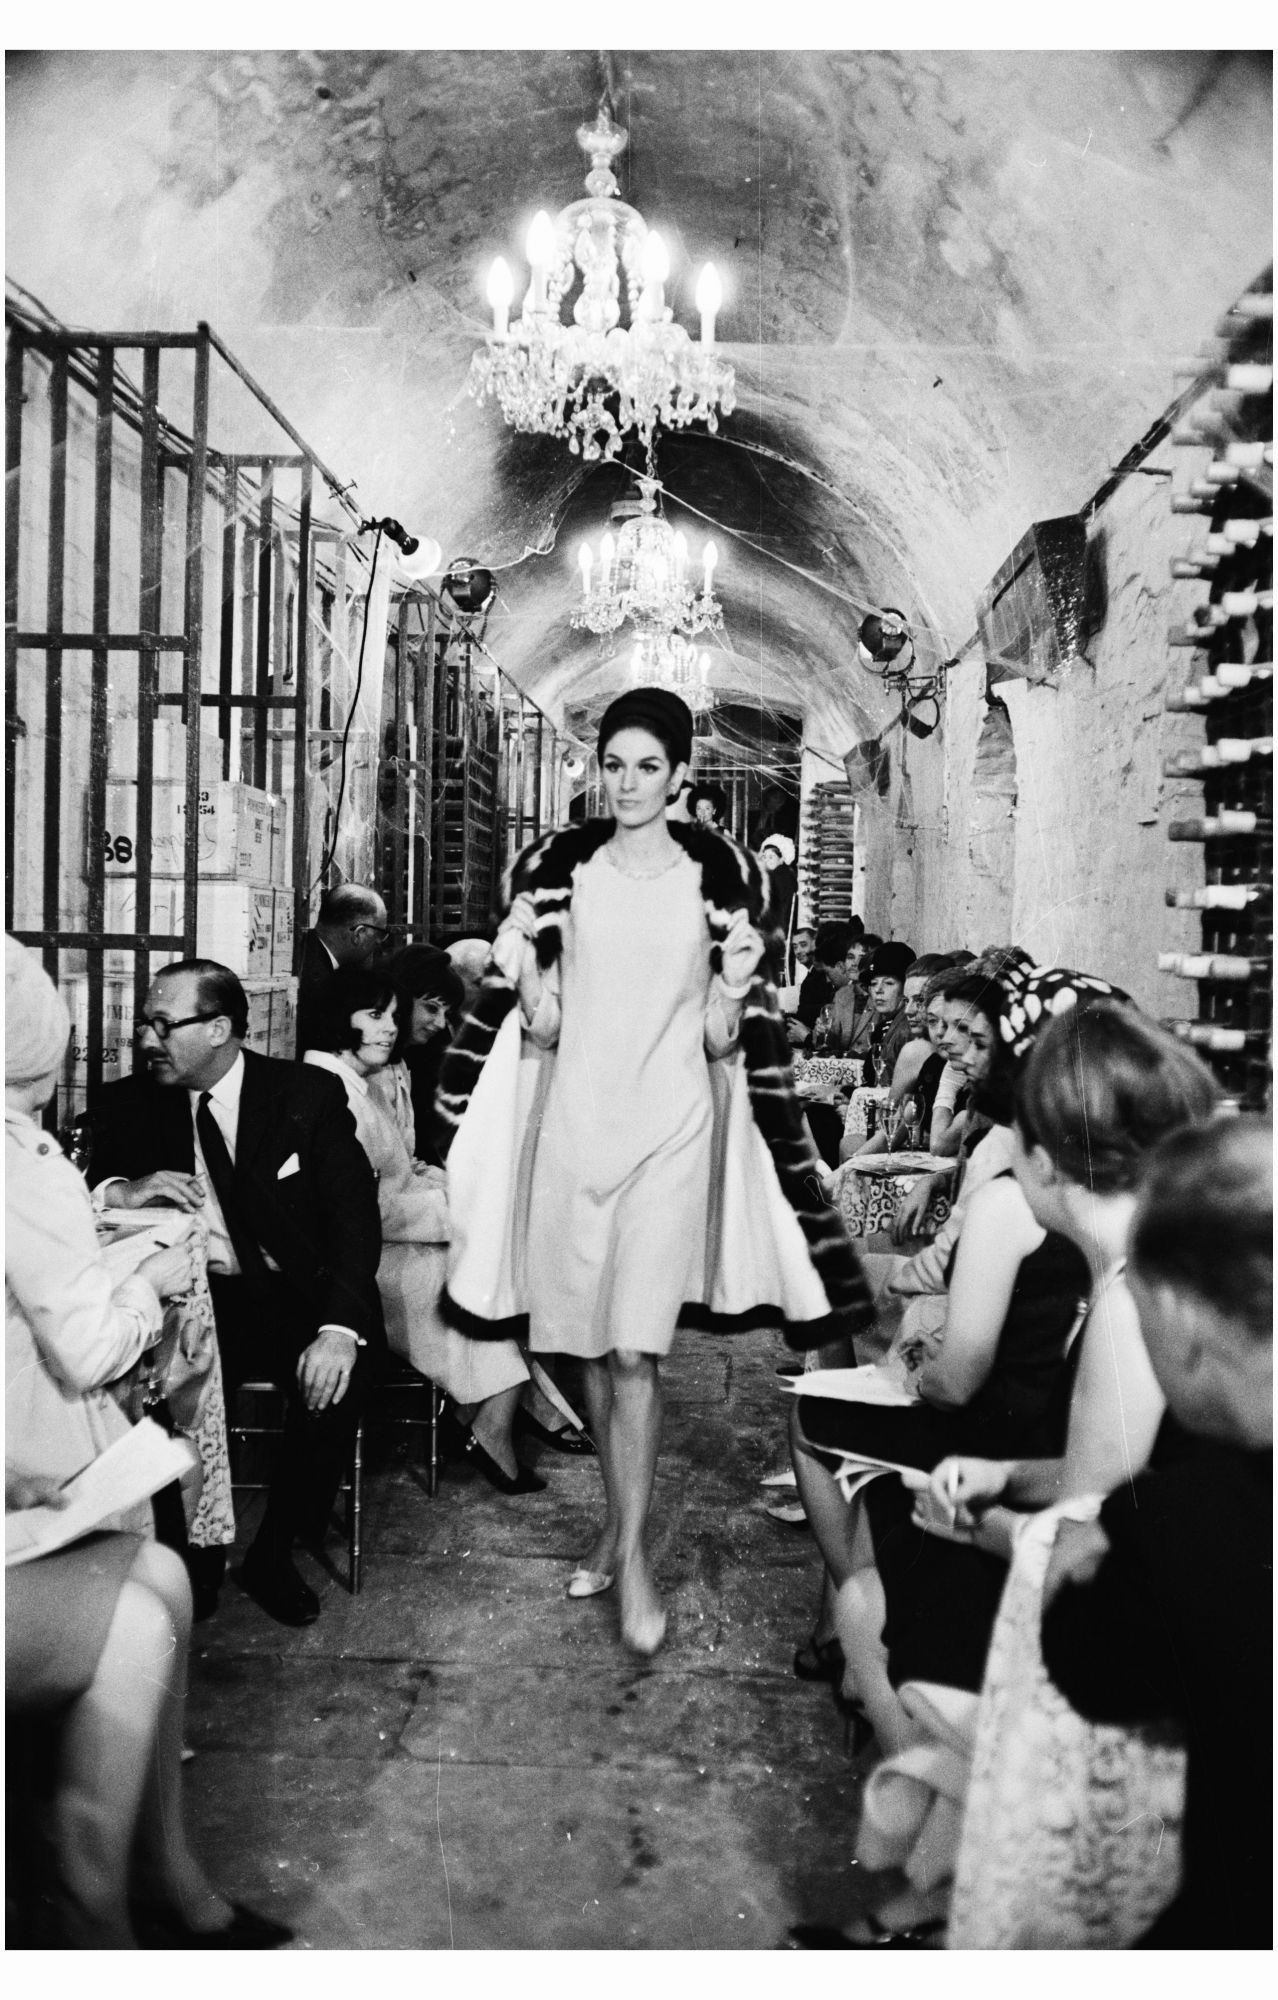 Fashion Flashback: Pierre Balmain